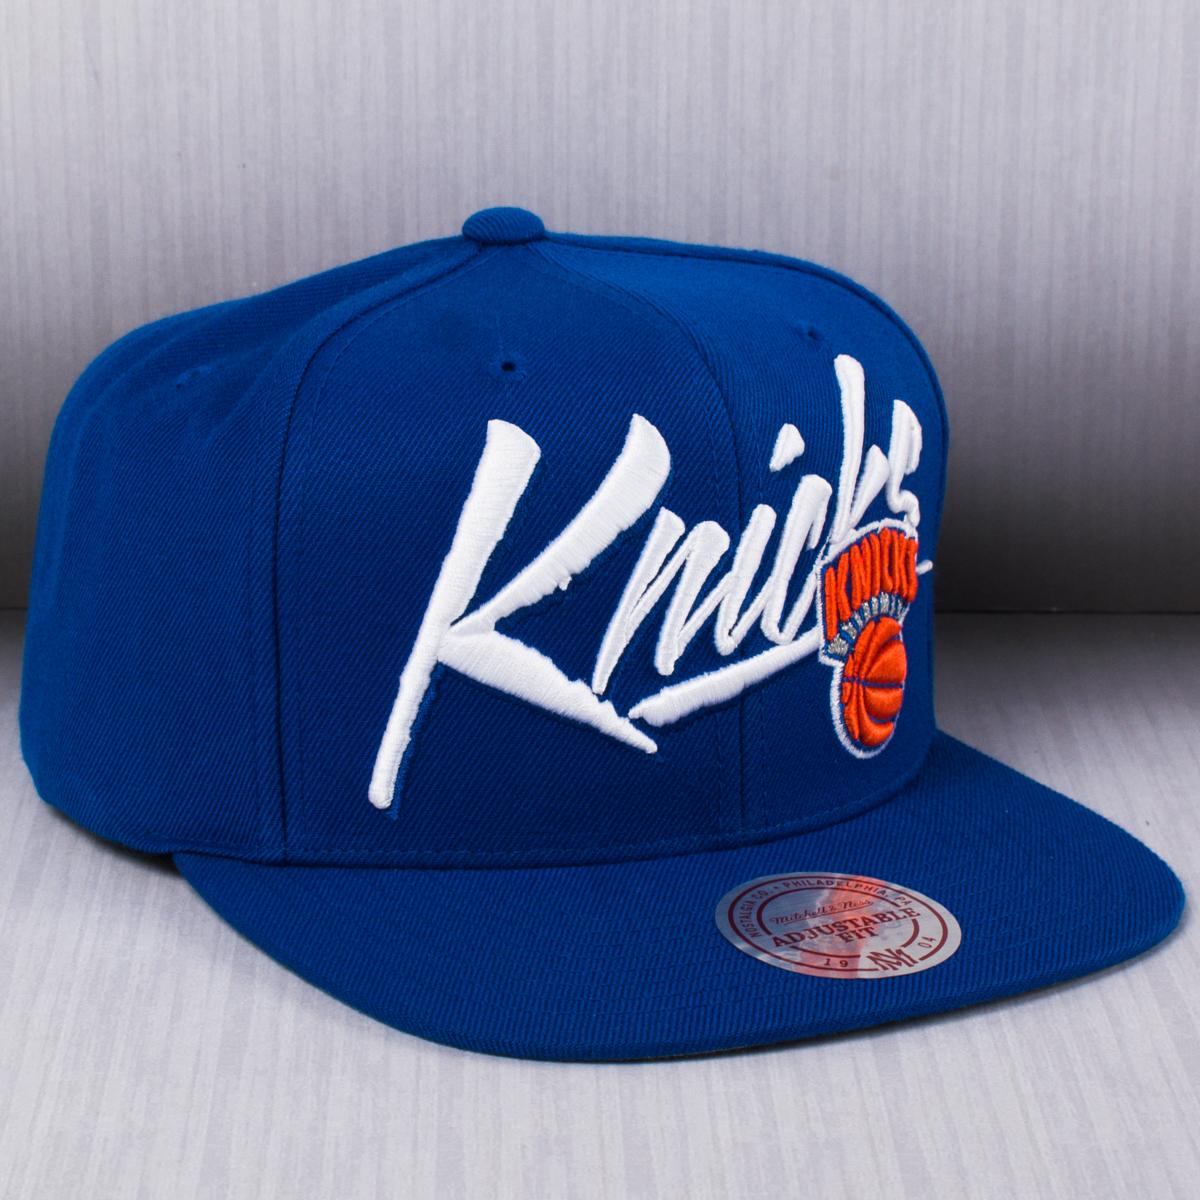 online retailer af212 1bf5e Mitchell   Ness NBA New York Knicks Vice Script Solid Snapback Cap - NBA  Shop New York Knicks Merchandise - Superfanas.lt